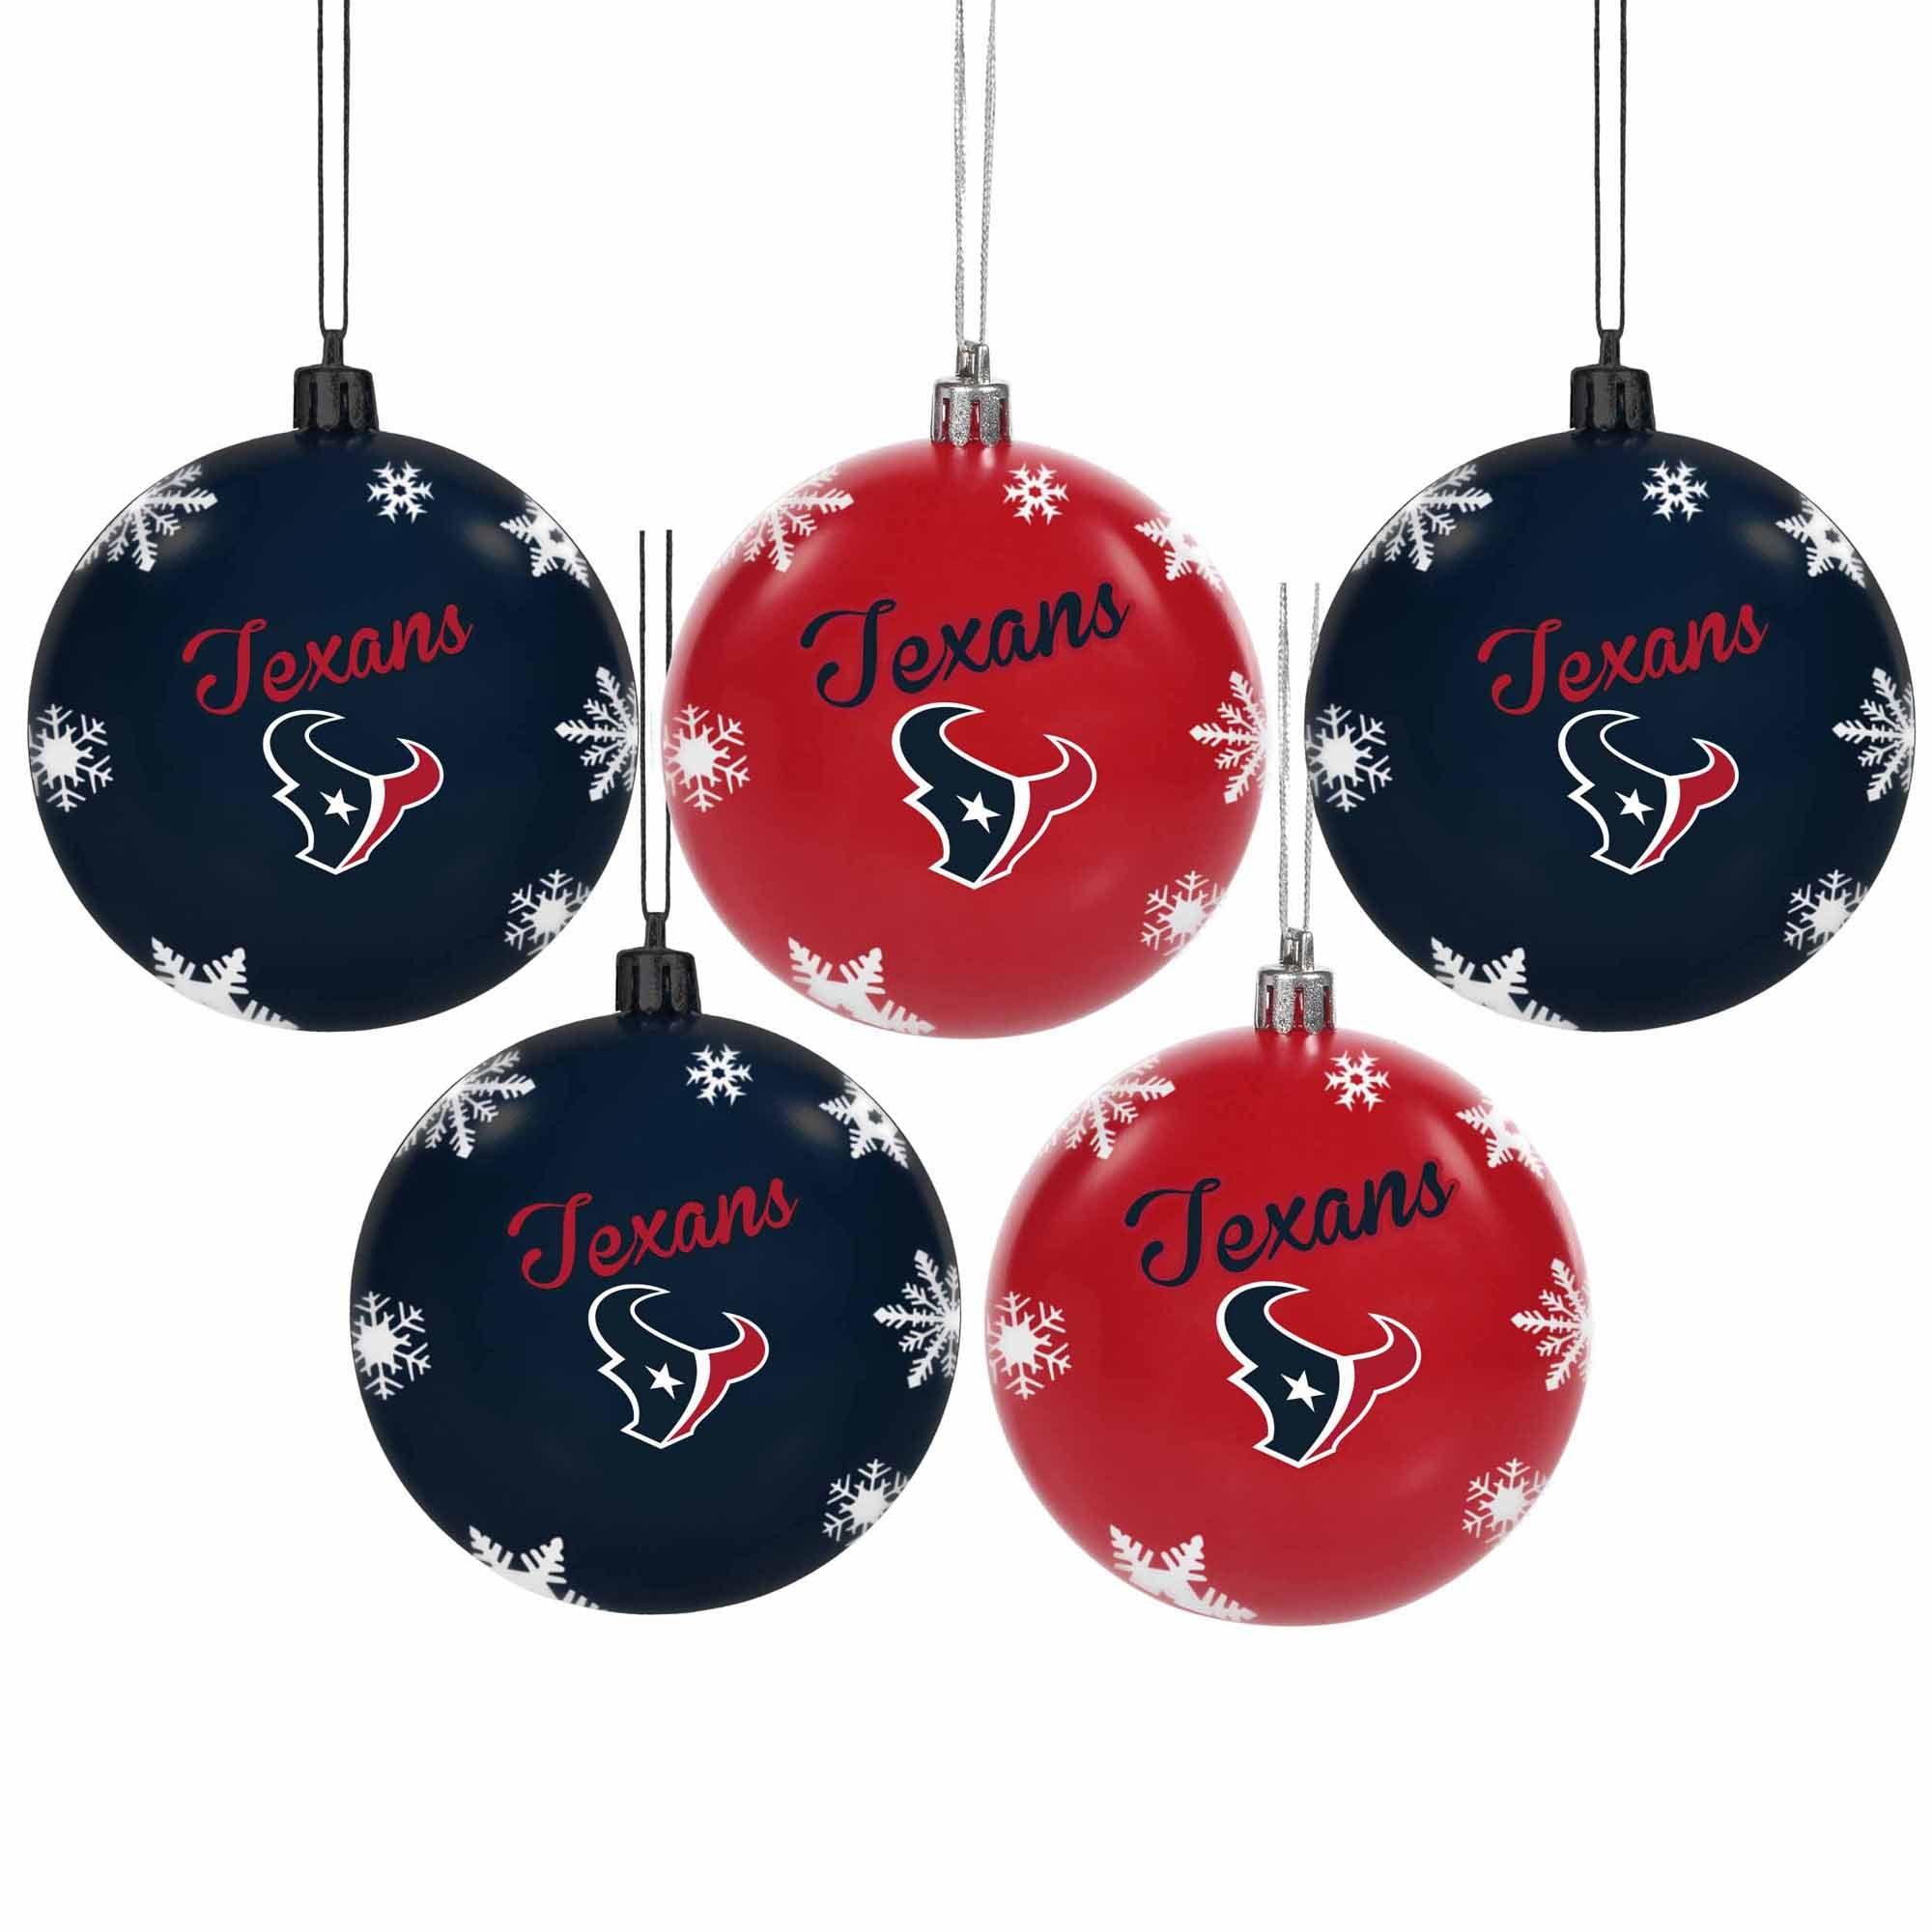 Houston Texans 5-Pack Set of Shatterproof Ball Ornaments